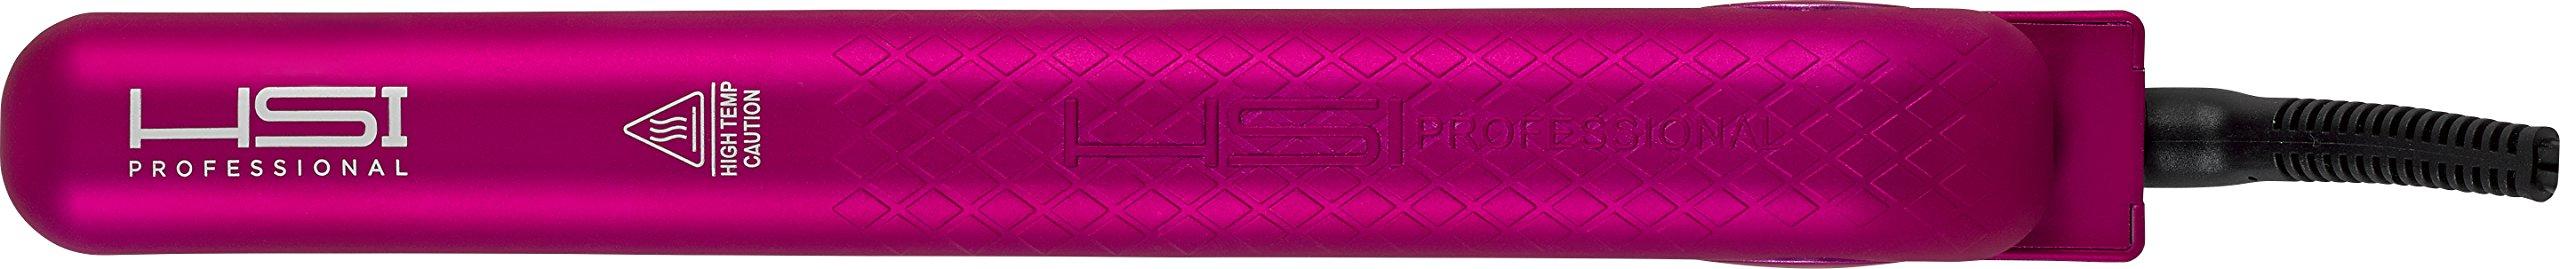 HSI Professional GliderPlus Pink Hair Straightener  | Digital Ceramic Ionic Tourmaline Flat Iron | Dual Voltage 110v-220v | Glove, Pouch & Argan Oil by HSI PROFESSIONAL